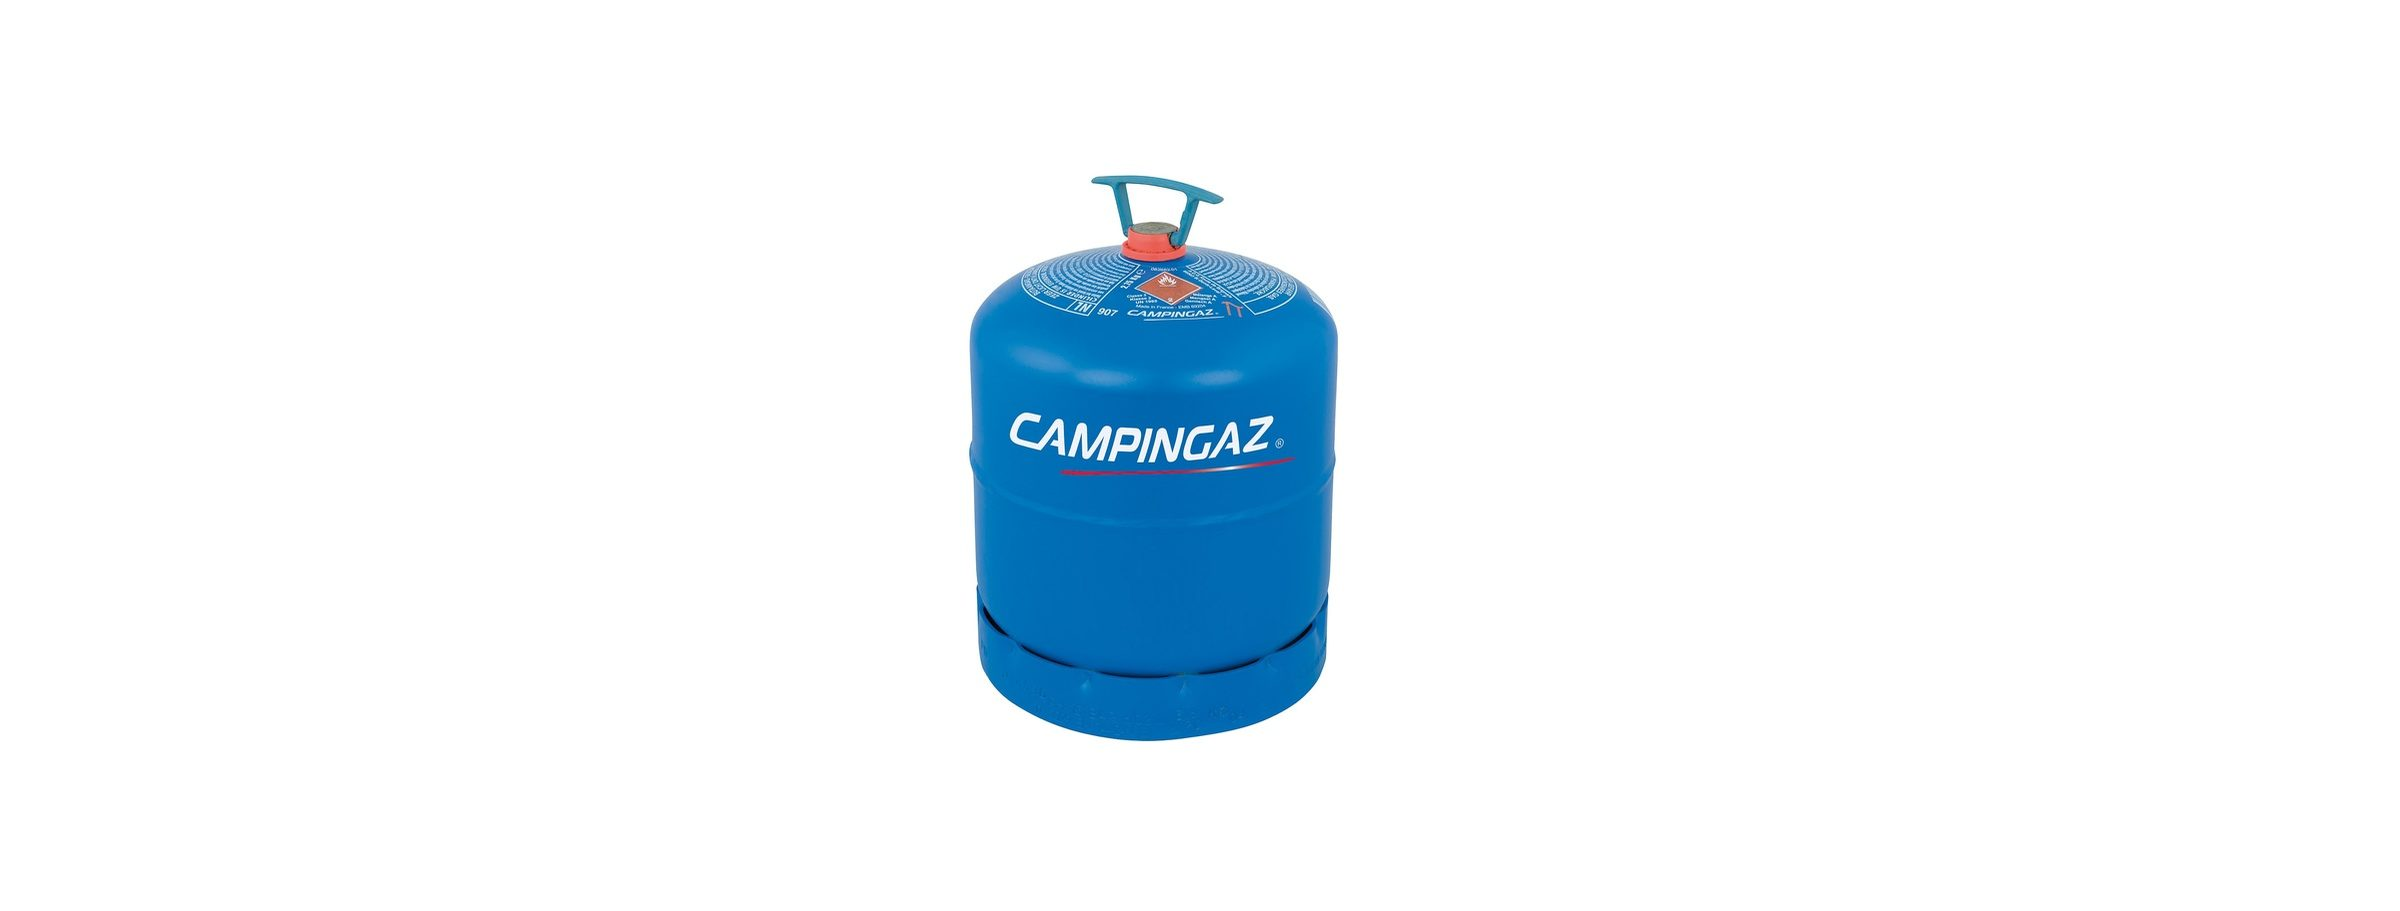 Campingaz 907 Cylinder